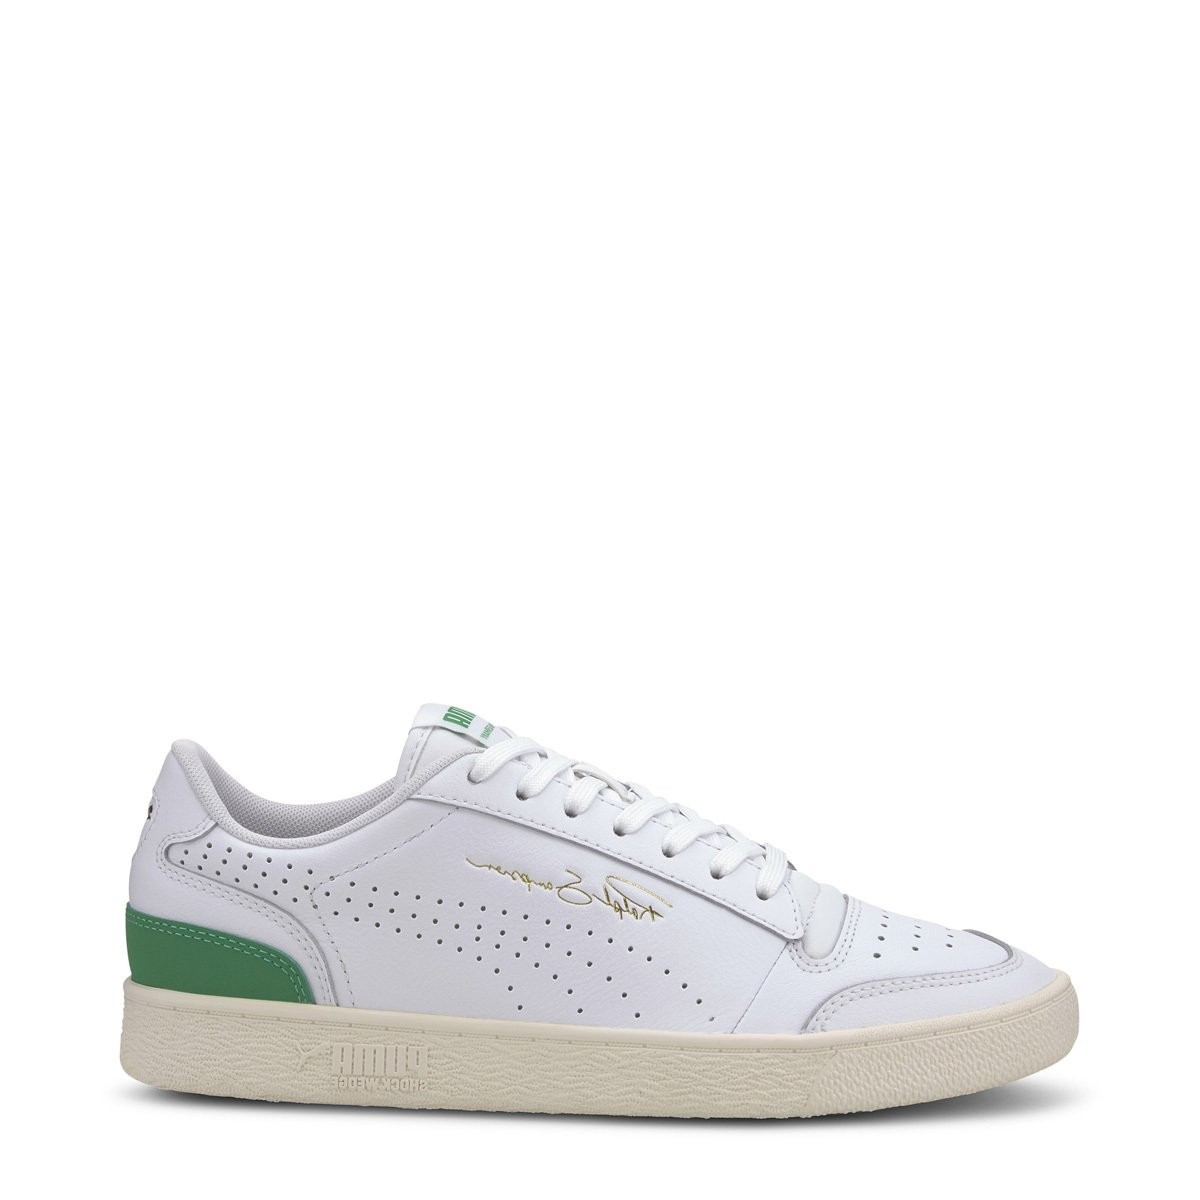 Puma Ralph Sampson Lo Perf Soft Erkek Ayakkabısı 372395-01